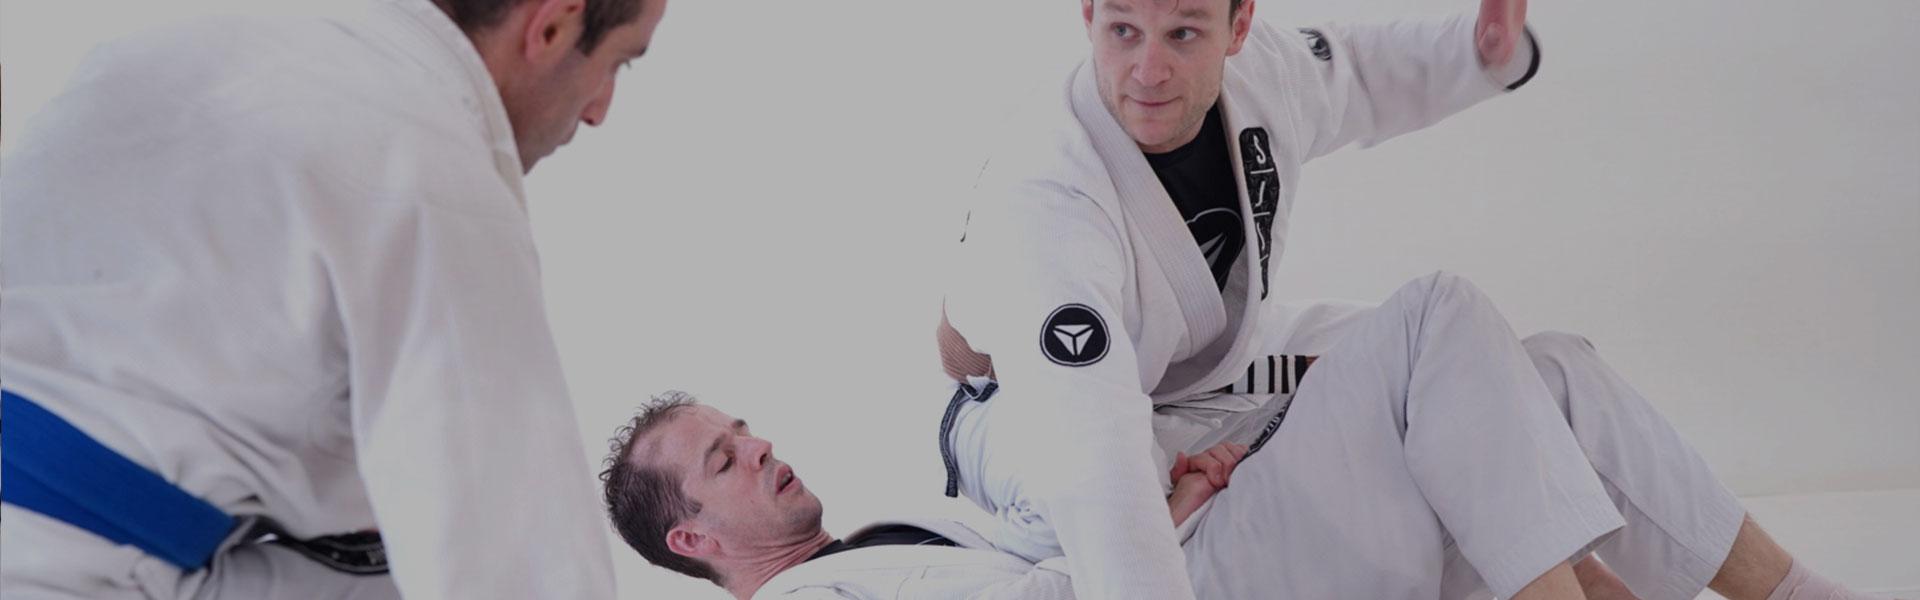 Jiu Jitsu for Adults in Sydney